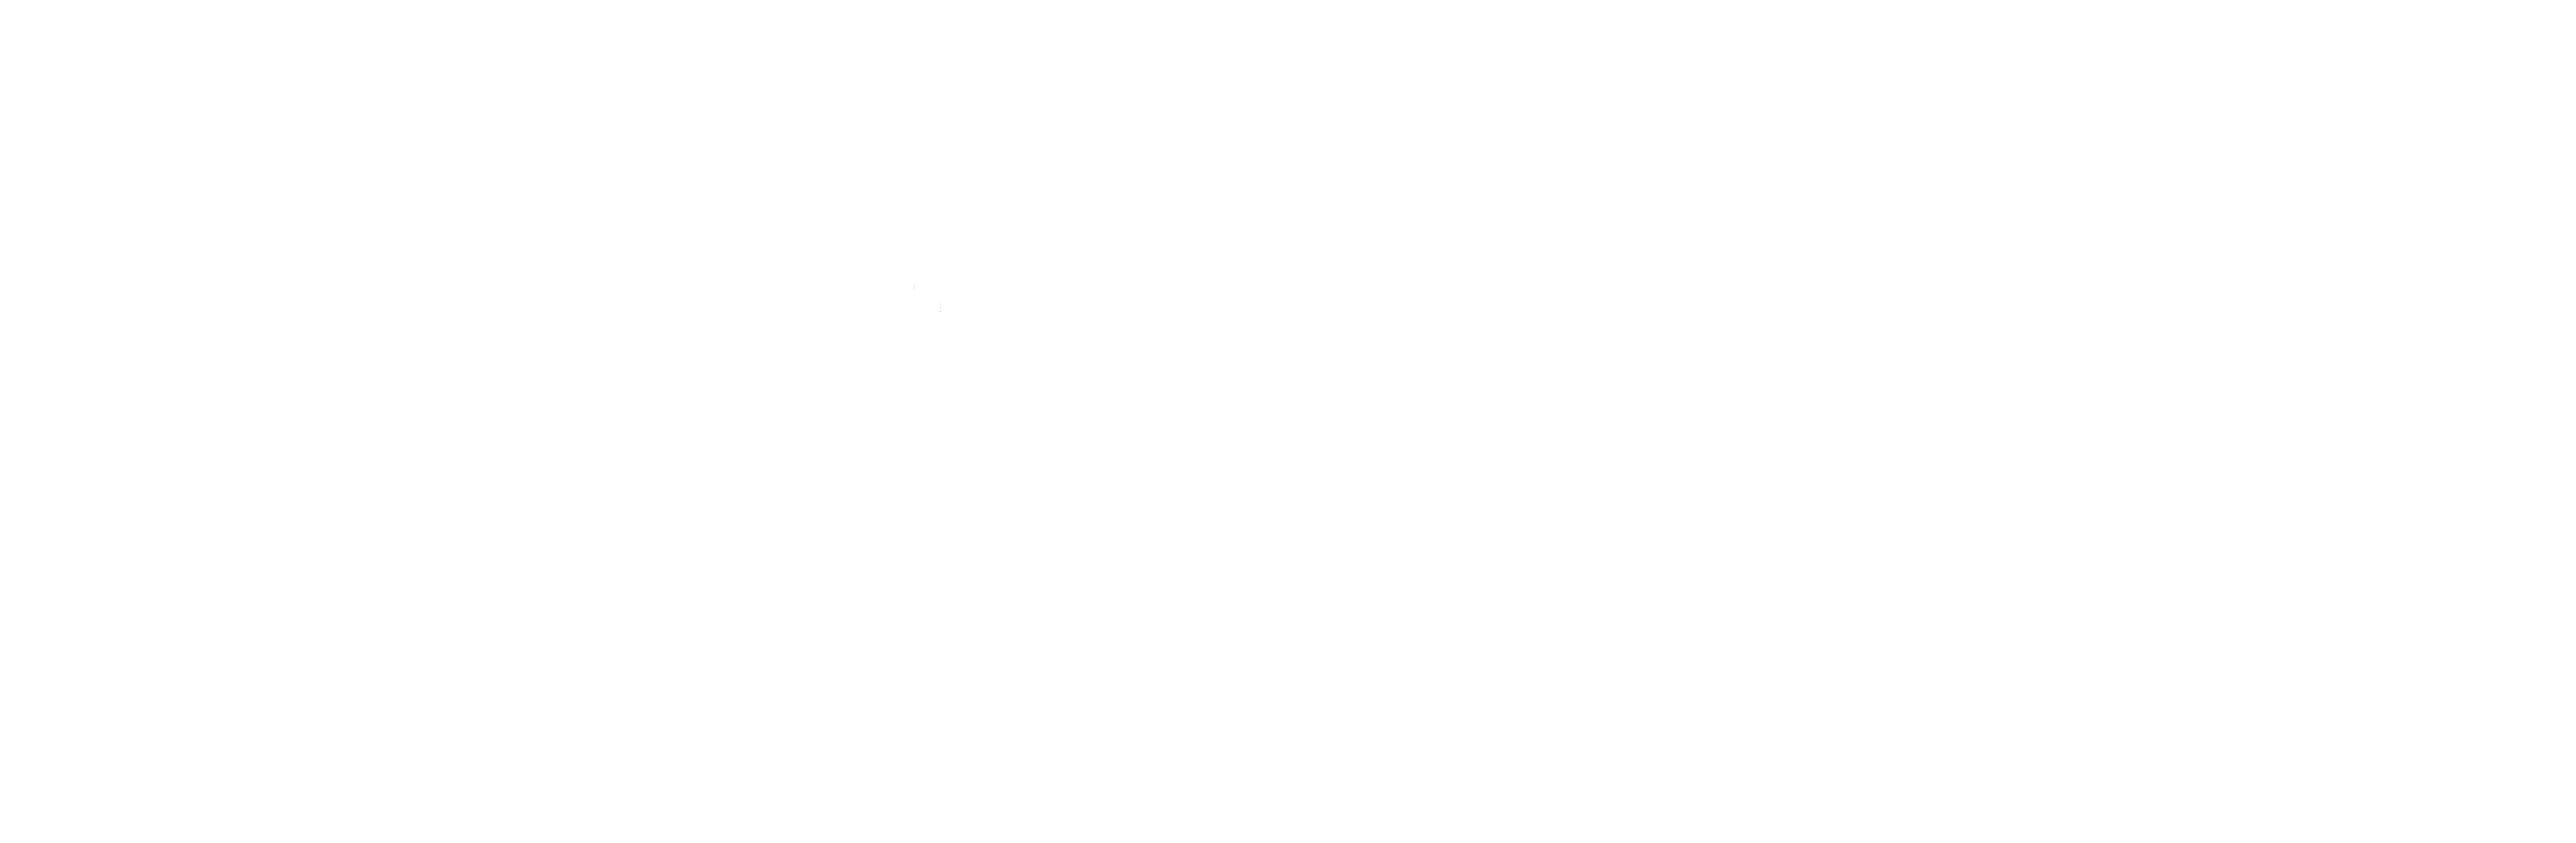 Dr-Hannes-Trattner-Hautarzt-Dermatologe-Logo